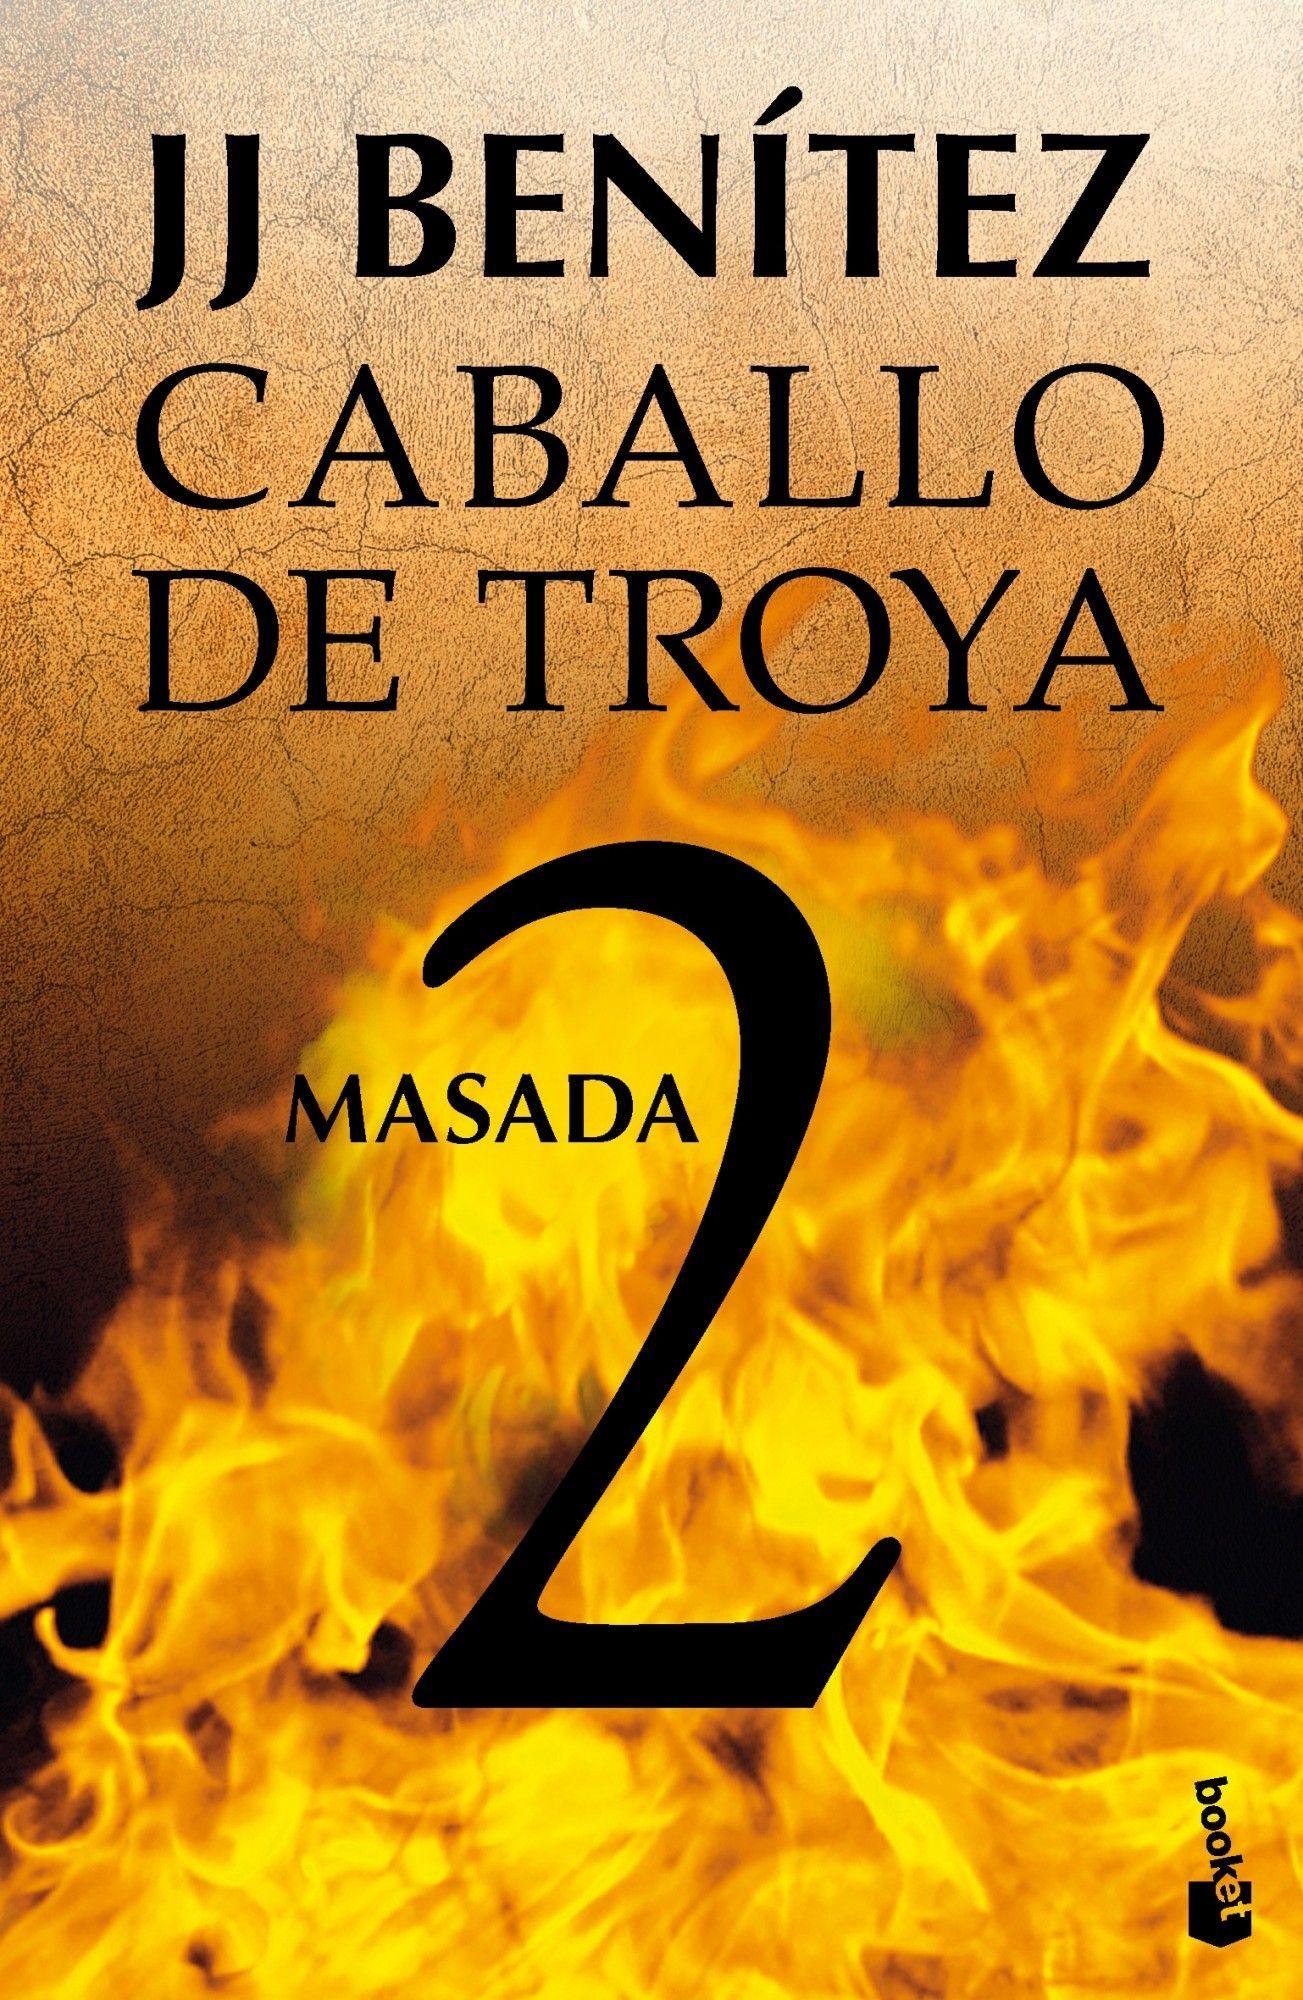 Caballo de Troya 2: Masada - J.J. Benitez - Booket